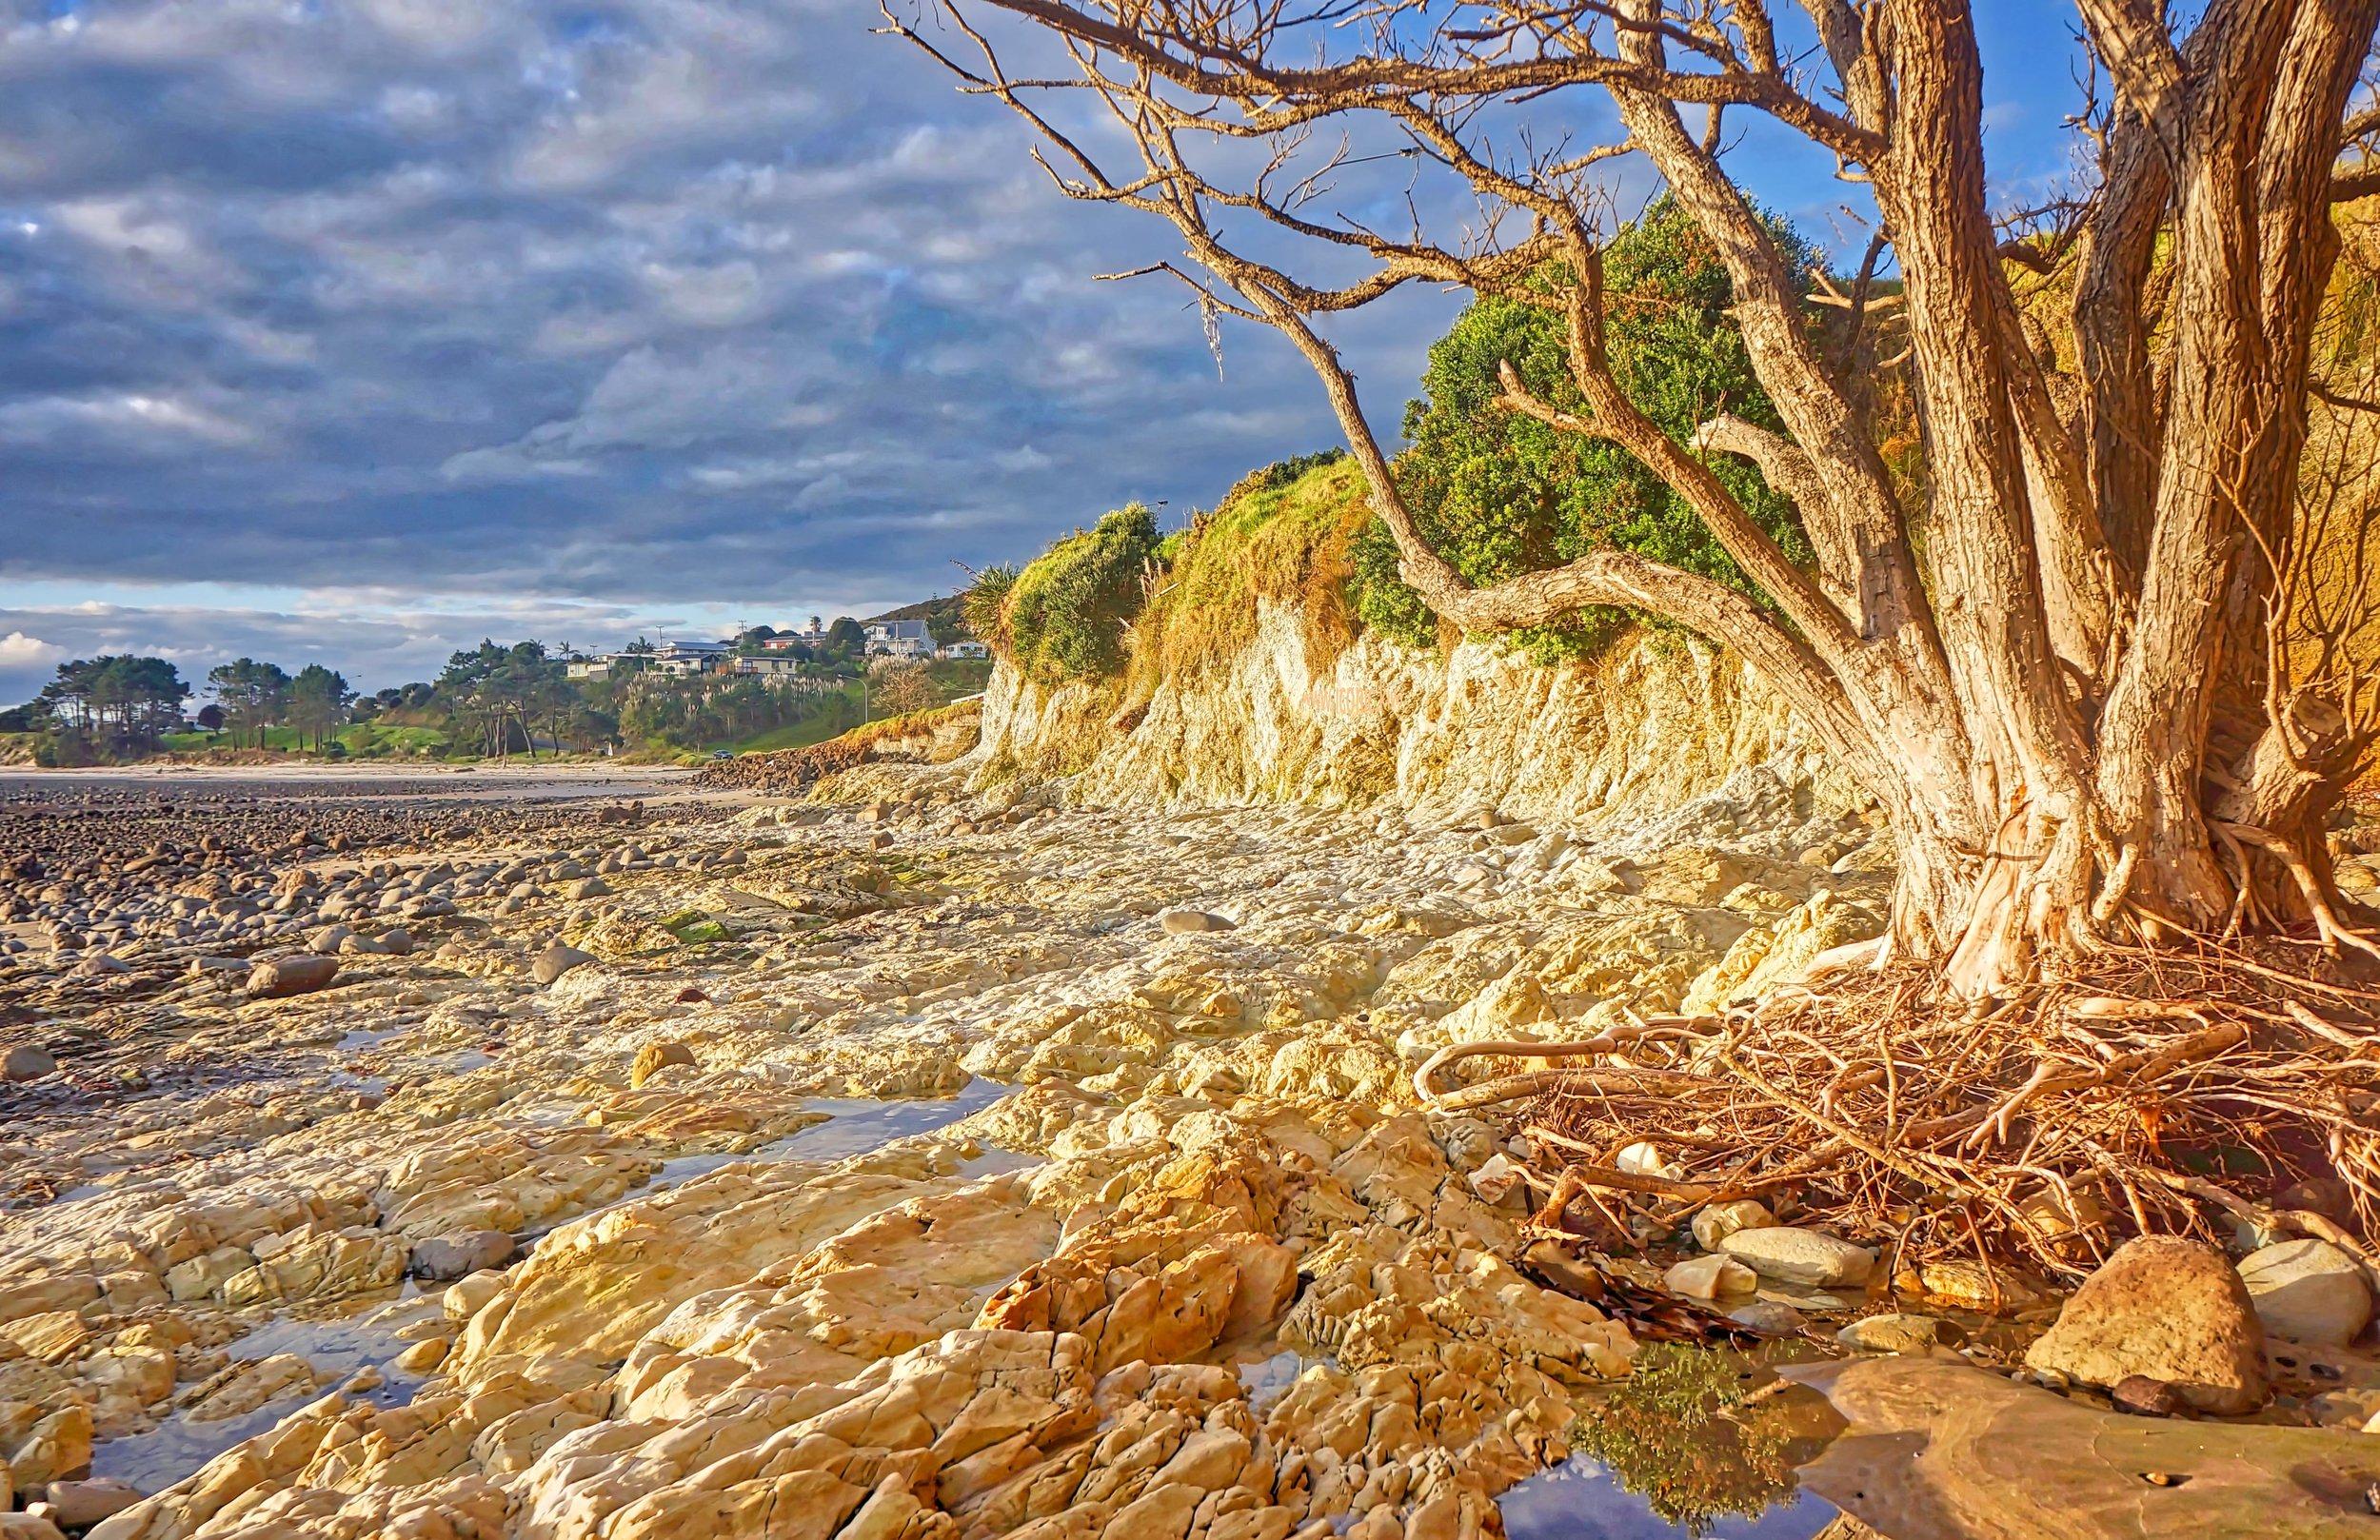 Evening beach walk at low tide, Hokianga, Northland, New Zealand